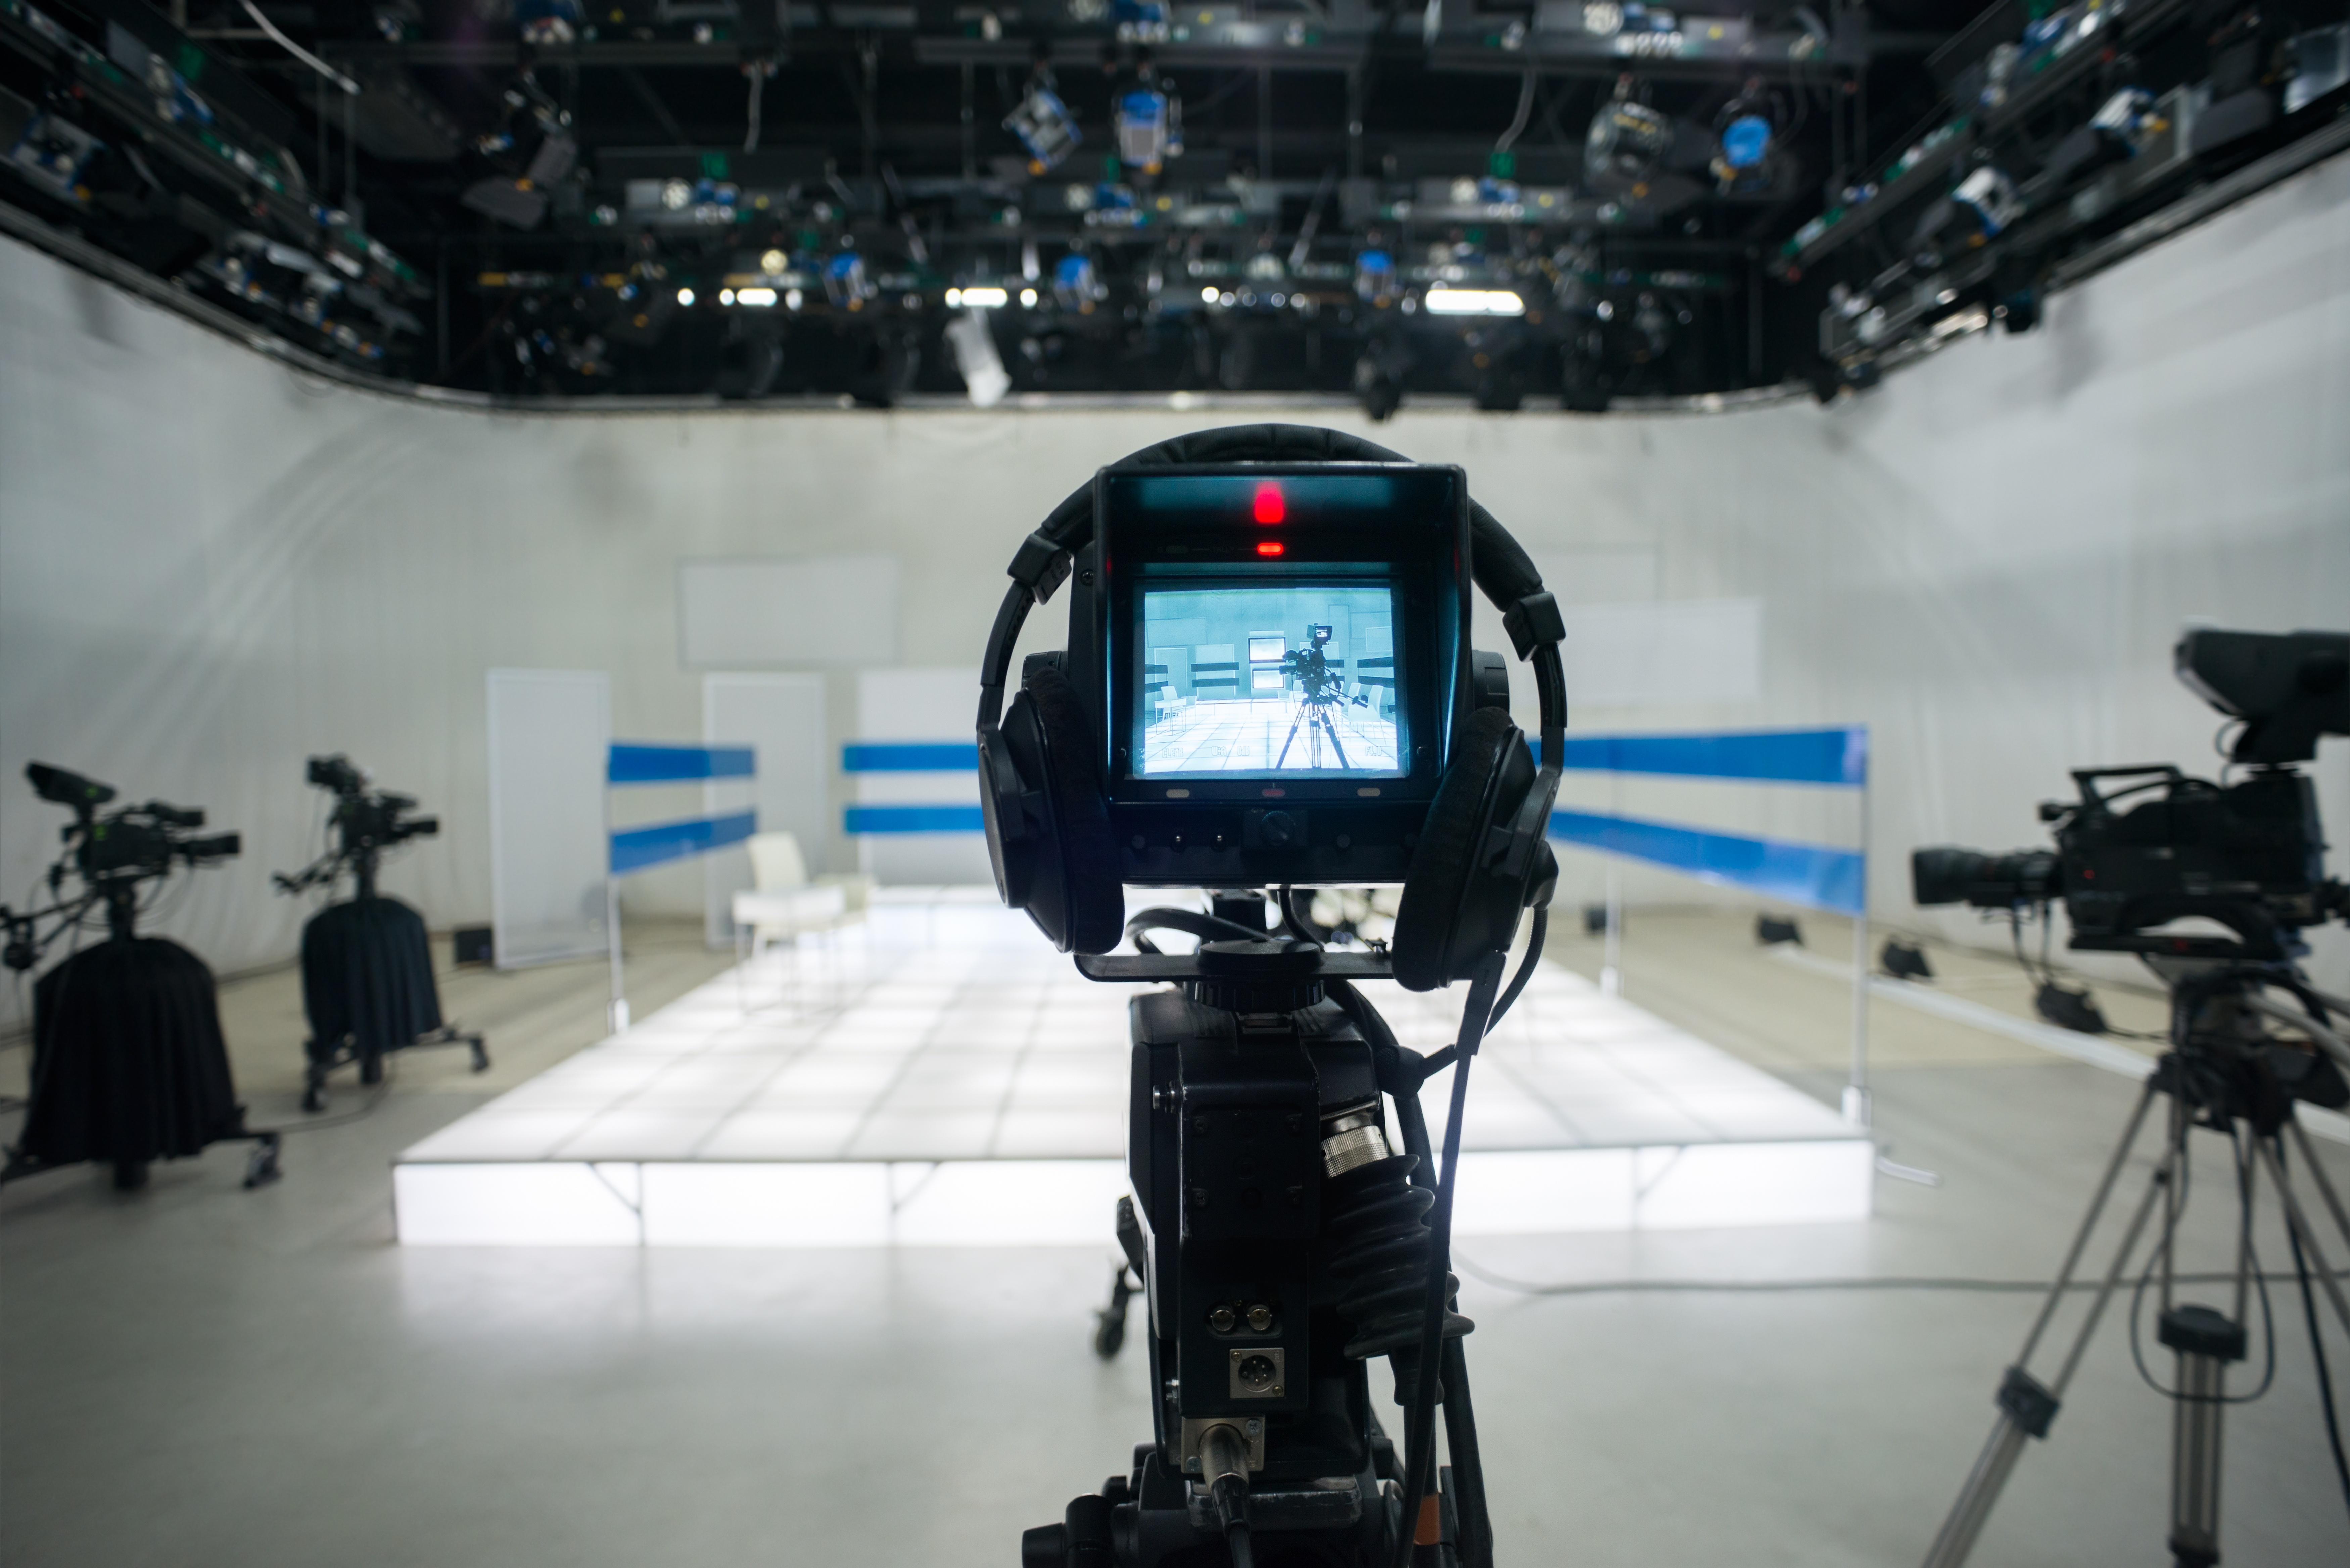 tv_studio_camera_straight_on